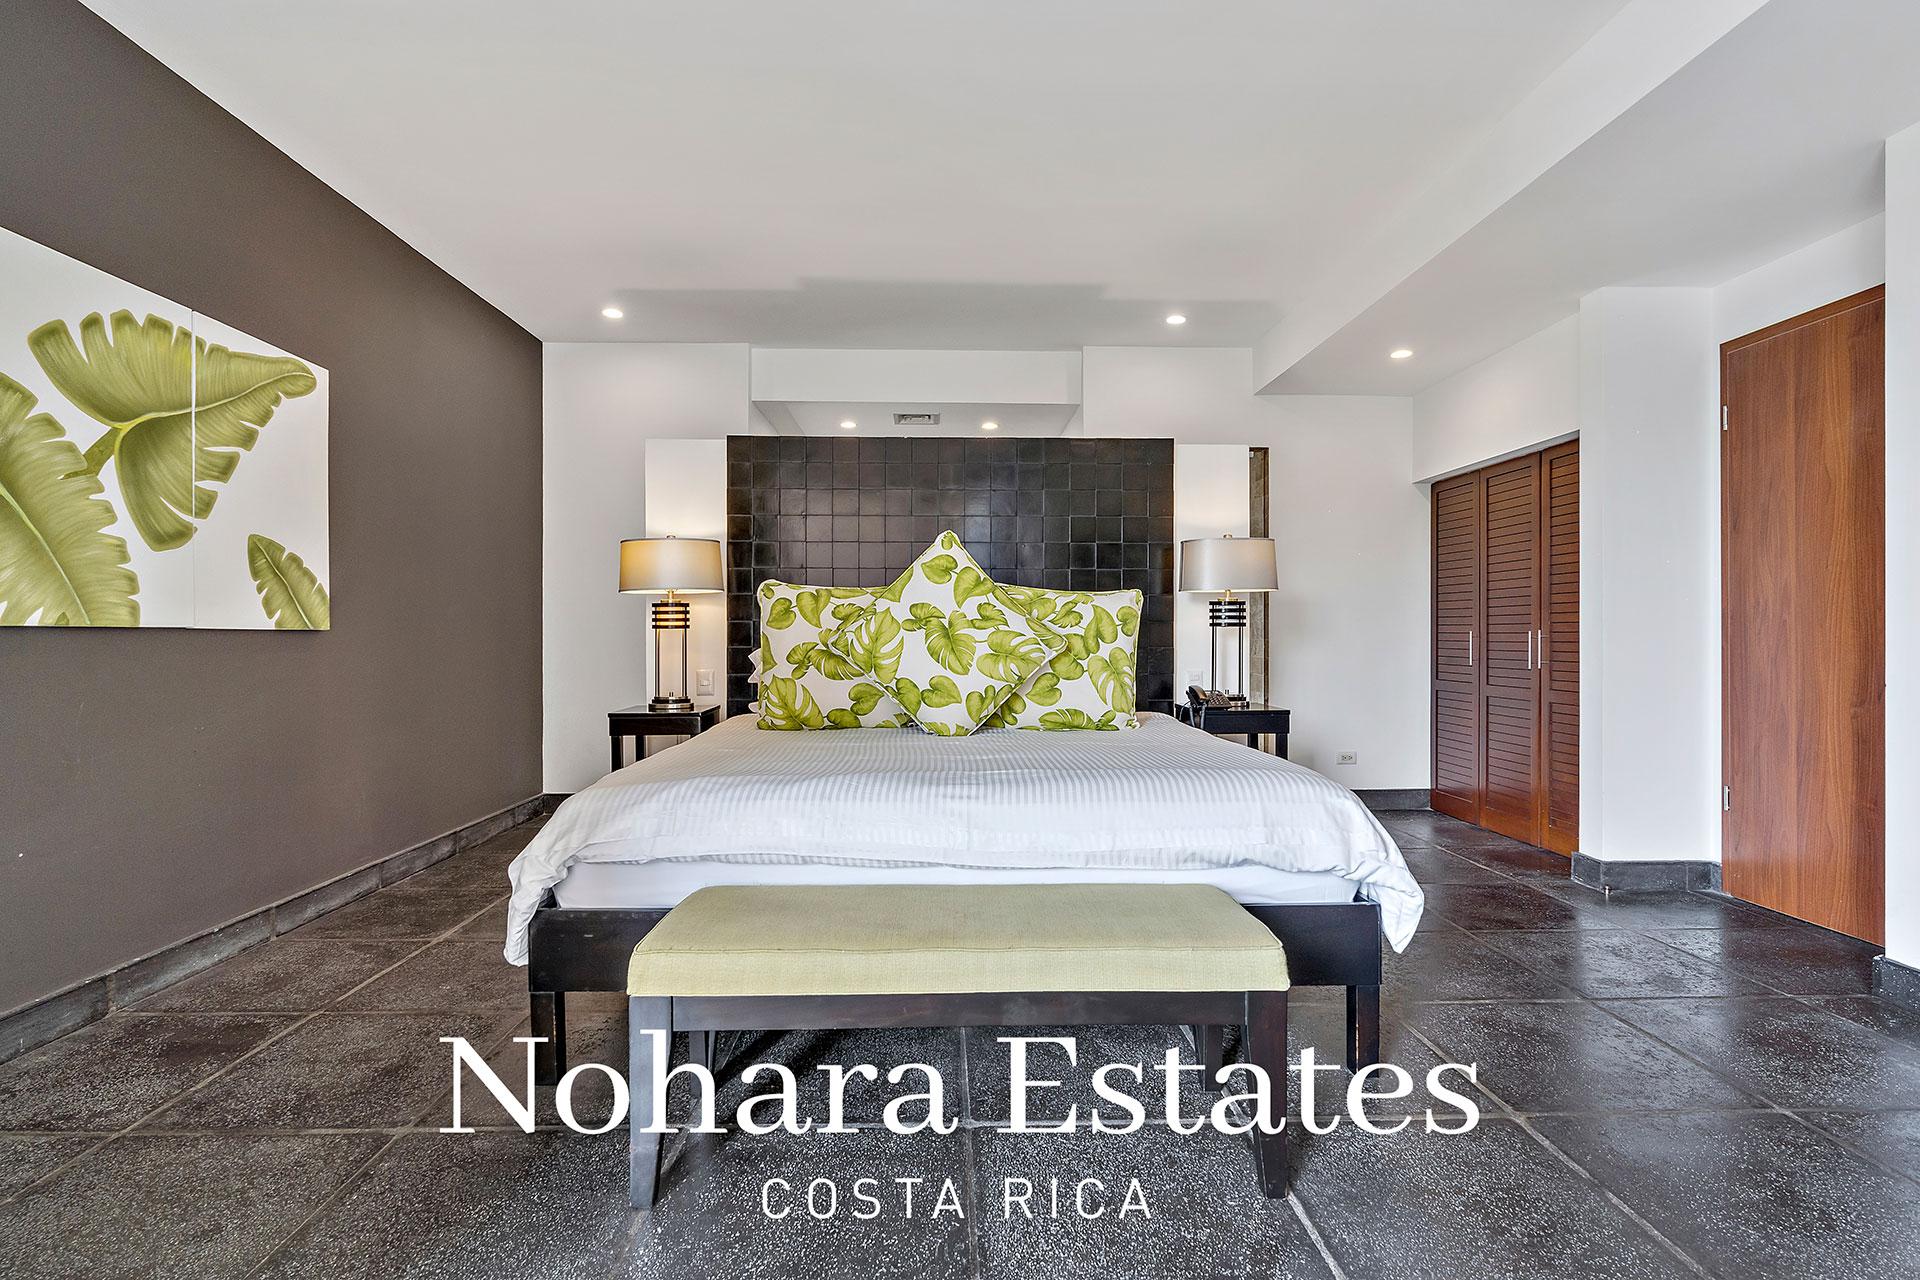 Nohara Estates Costa Rica 125 Apartment Quepos Los Altos 11